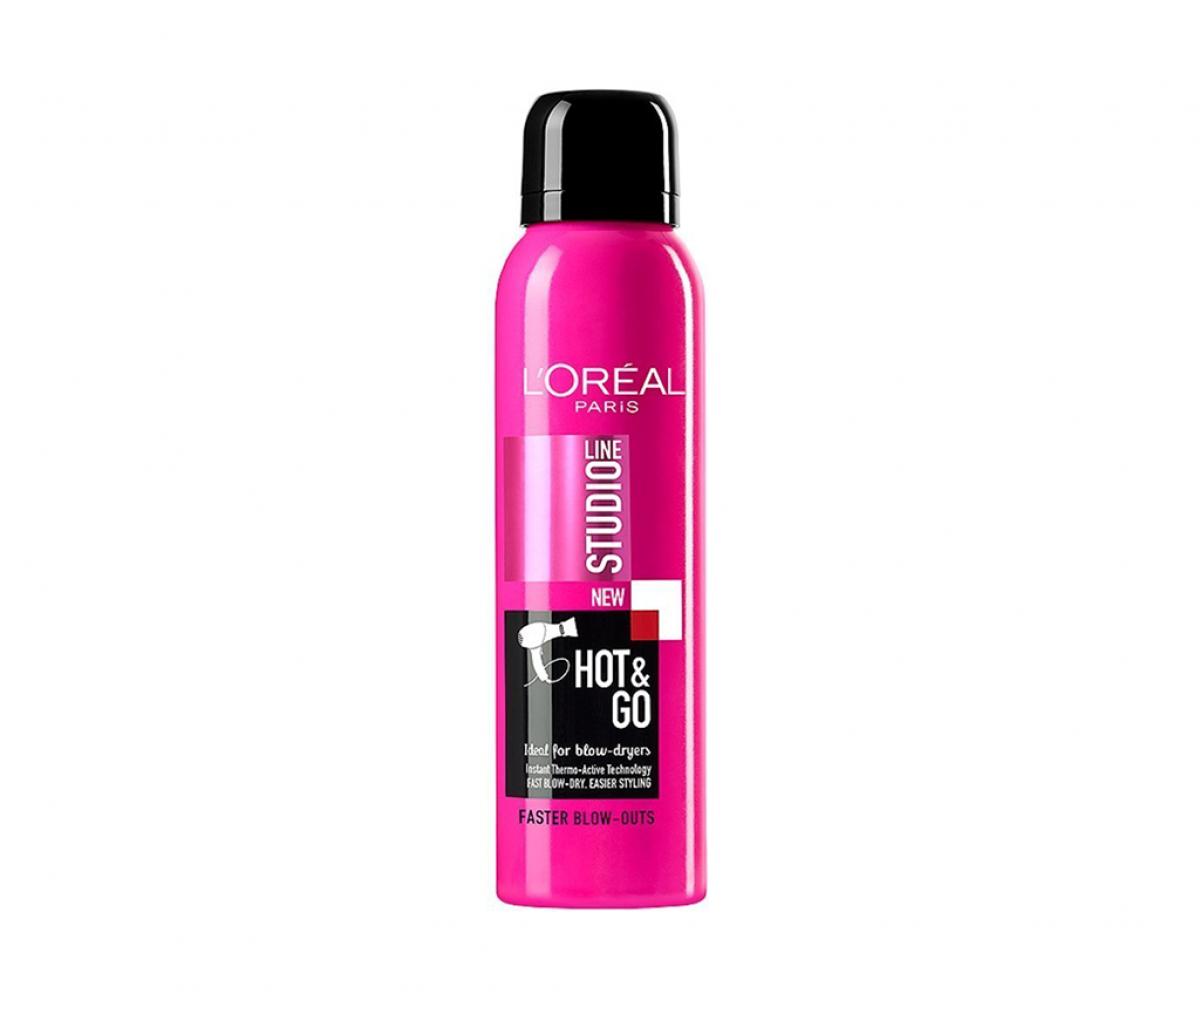 L'Oreal Studio Line Hot & Go Hair Spray